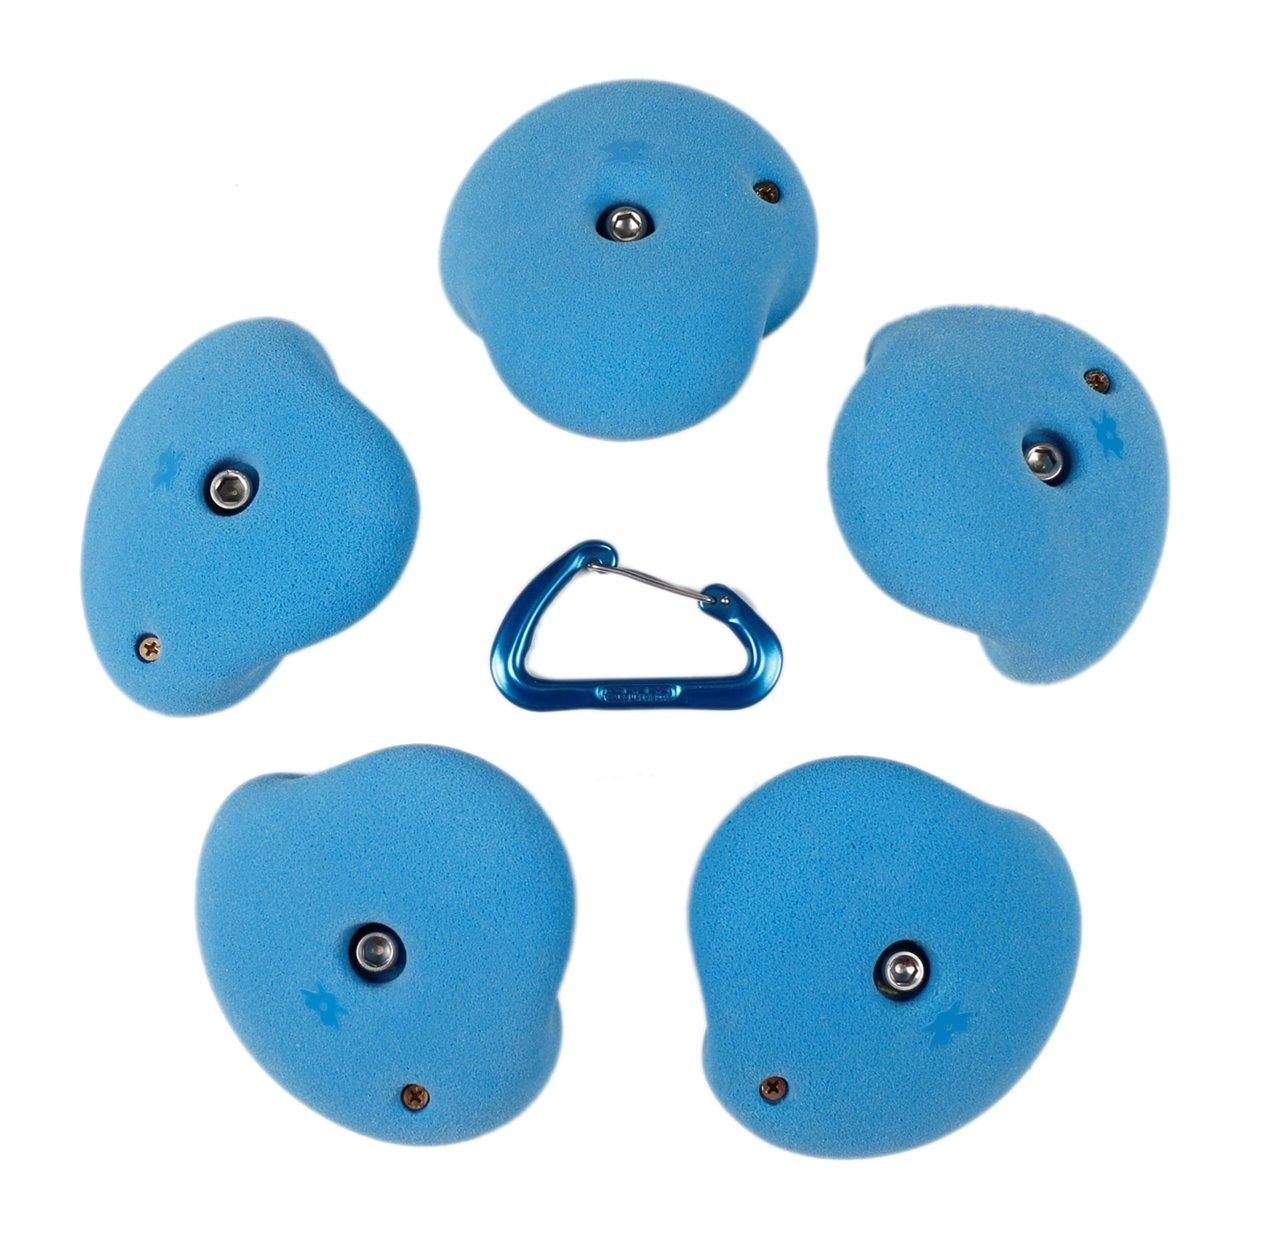 5 XL Double Incut Roof Jugs Set #3 l Climbing Holds l Blue